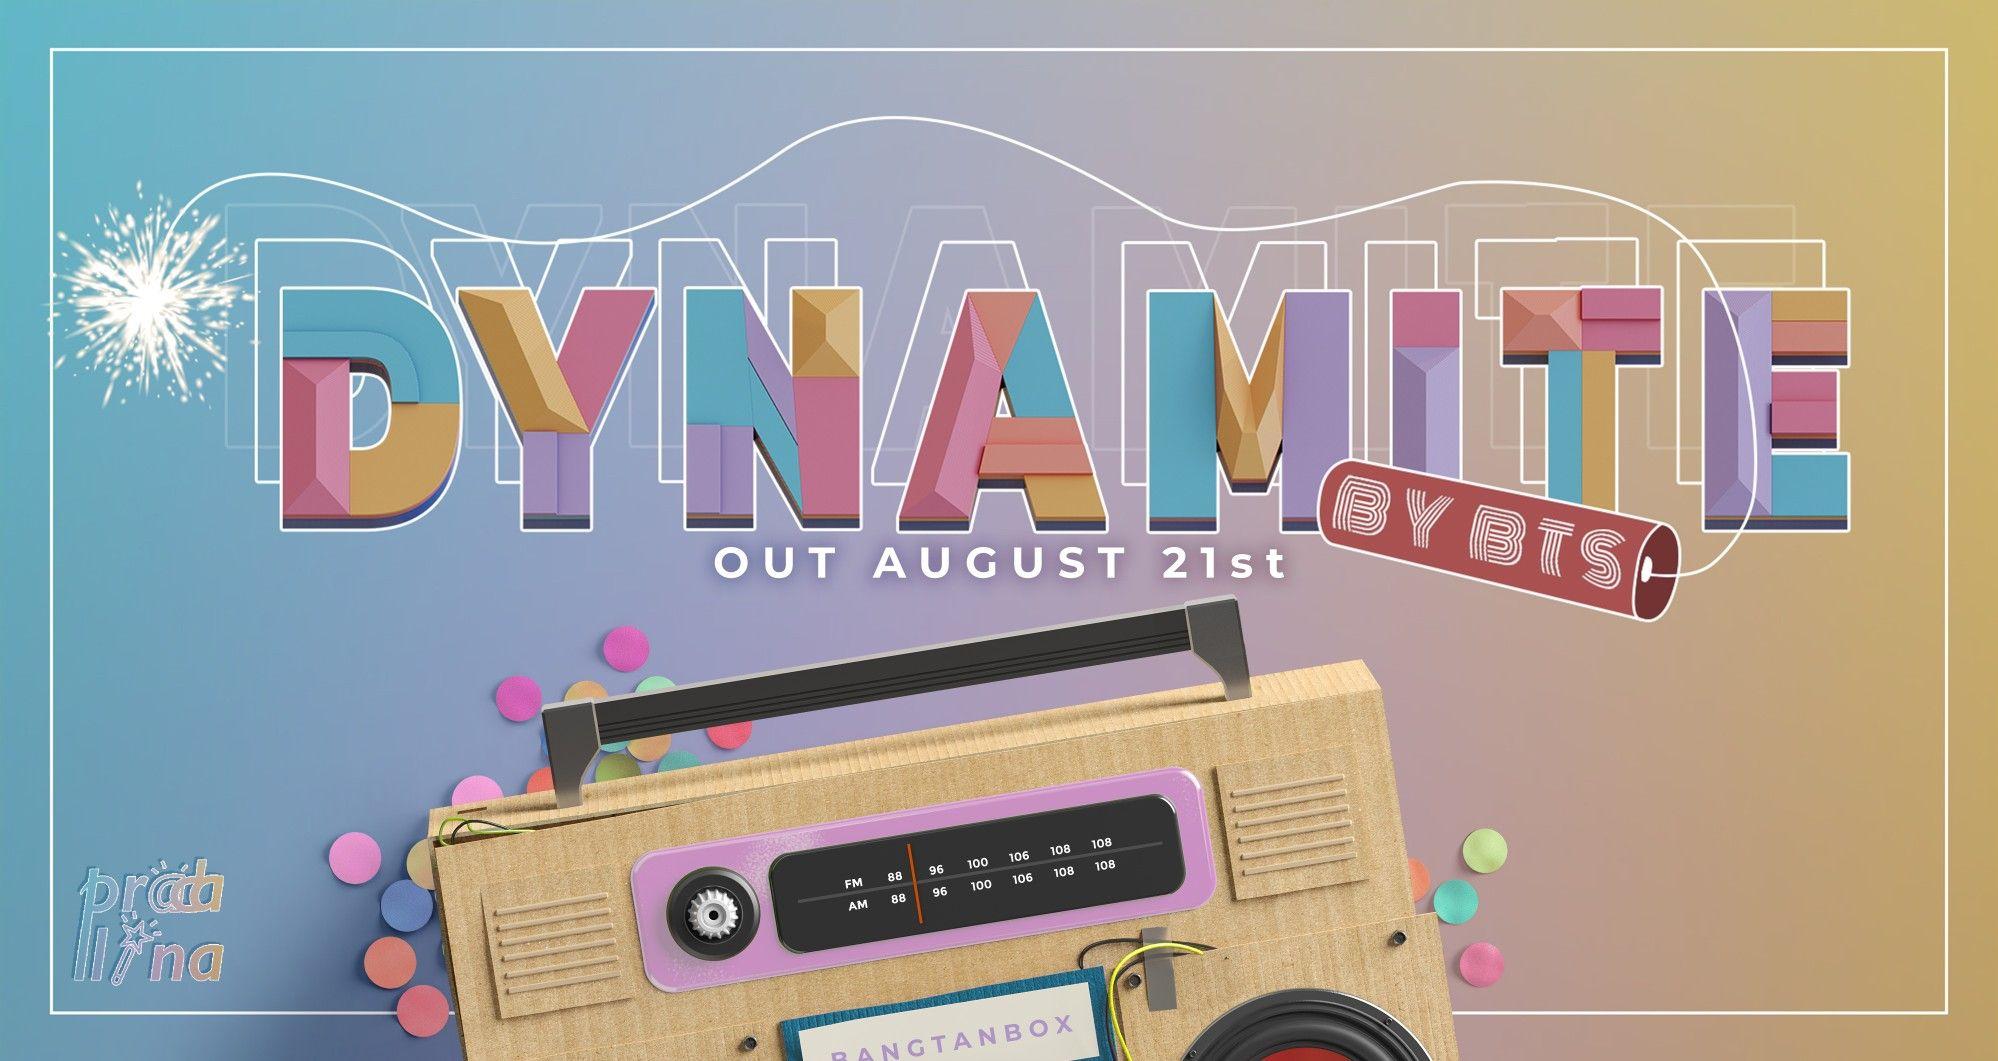 Dynamite By Bts Out August 21st Bts Wallpaper Bts Fanart Bts Wallpaper Desktop Bts army hd wallpaper for laptop